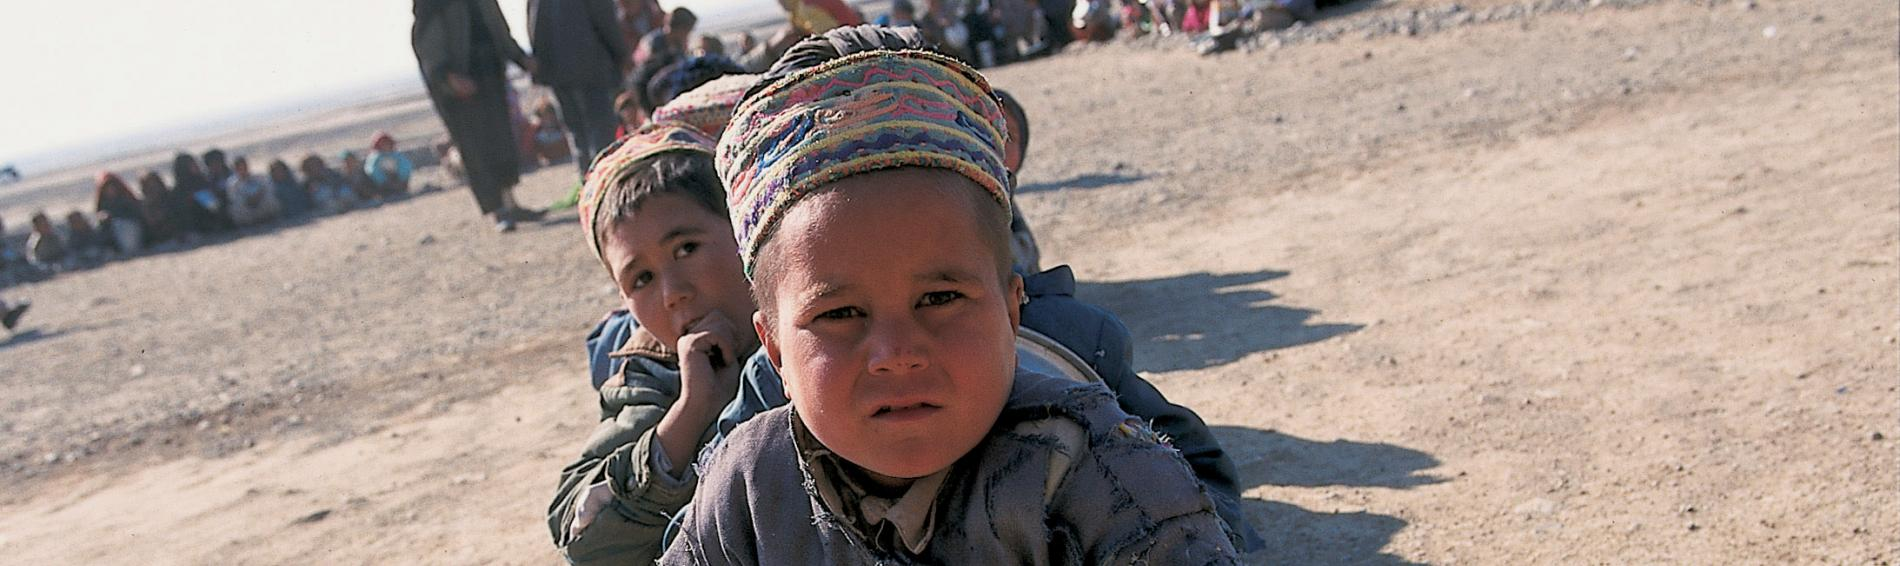 Kind in Afghanistan. Foto: Stéphane Lehr.